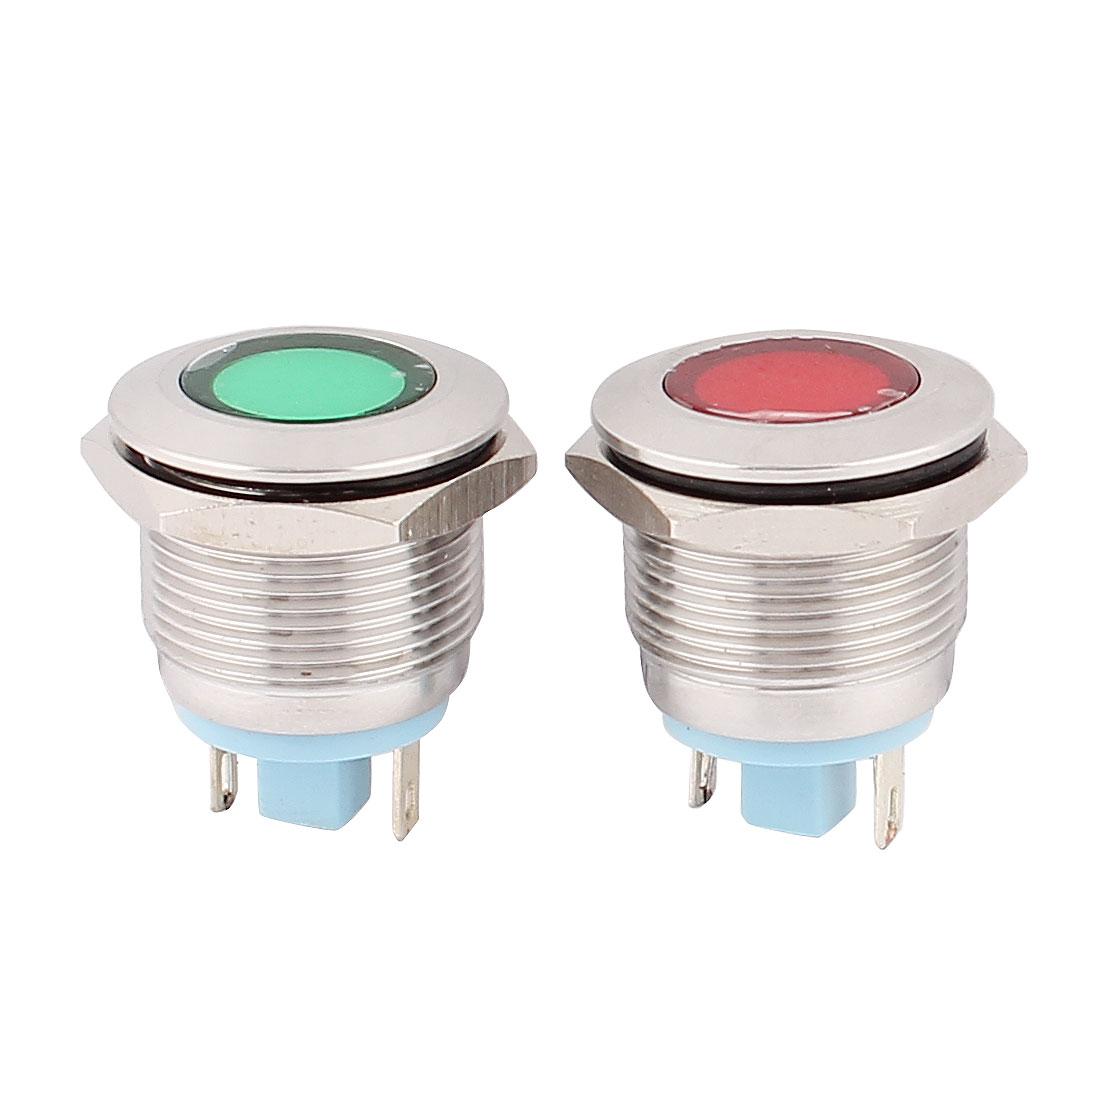 2Pcs 19mm Mounted Thread DC 12V Red Green LED Indicator Light Set